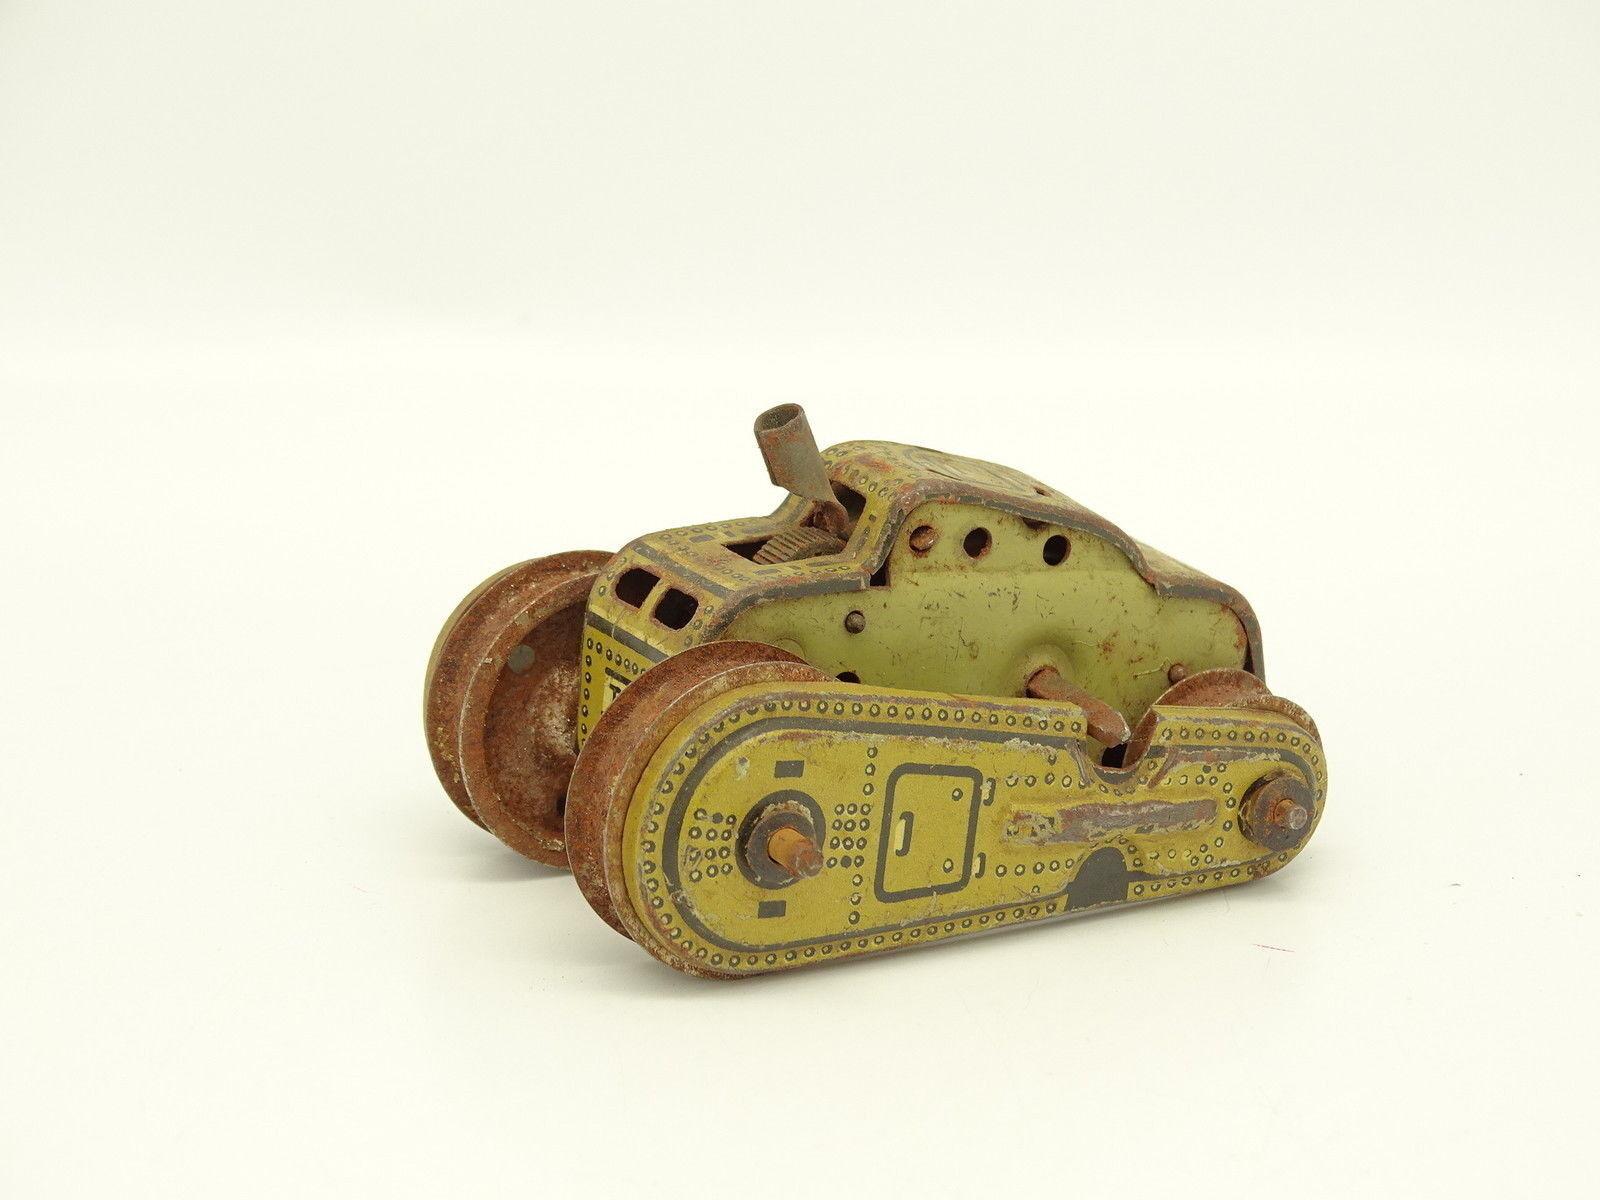 vendita all'ingrosso Gama Mettuttio Mettuttio Mettuttio - Char Tank DRGM  disegni esclusivi